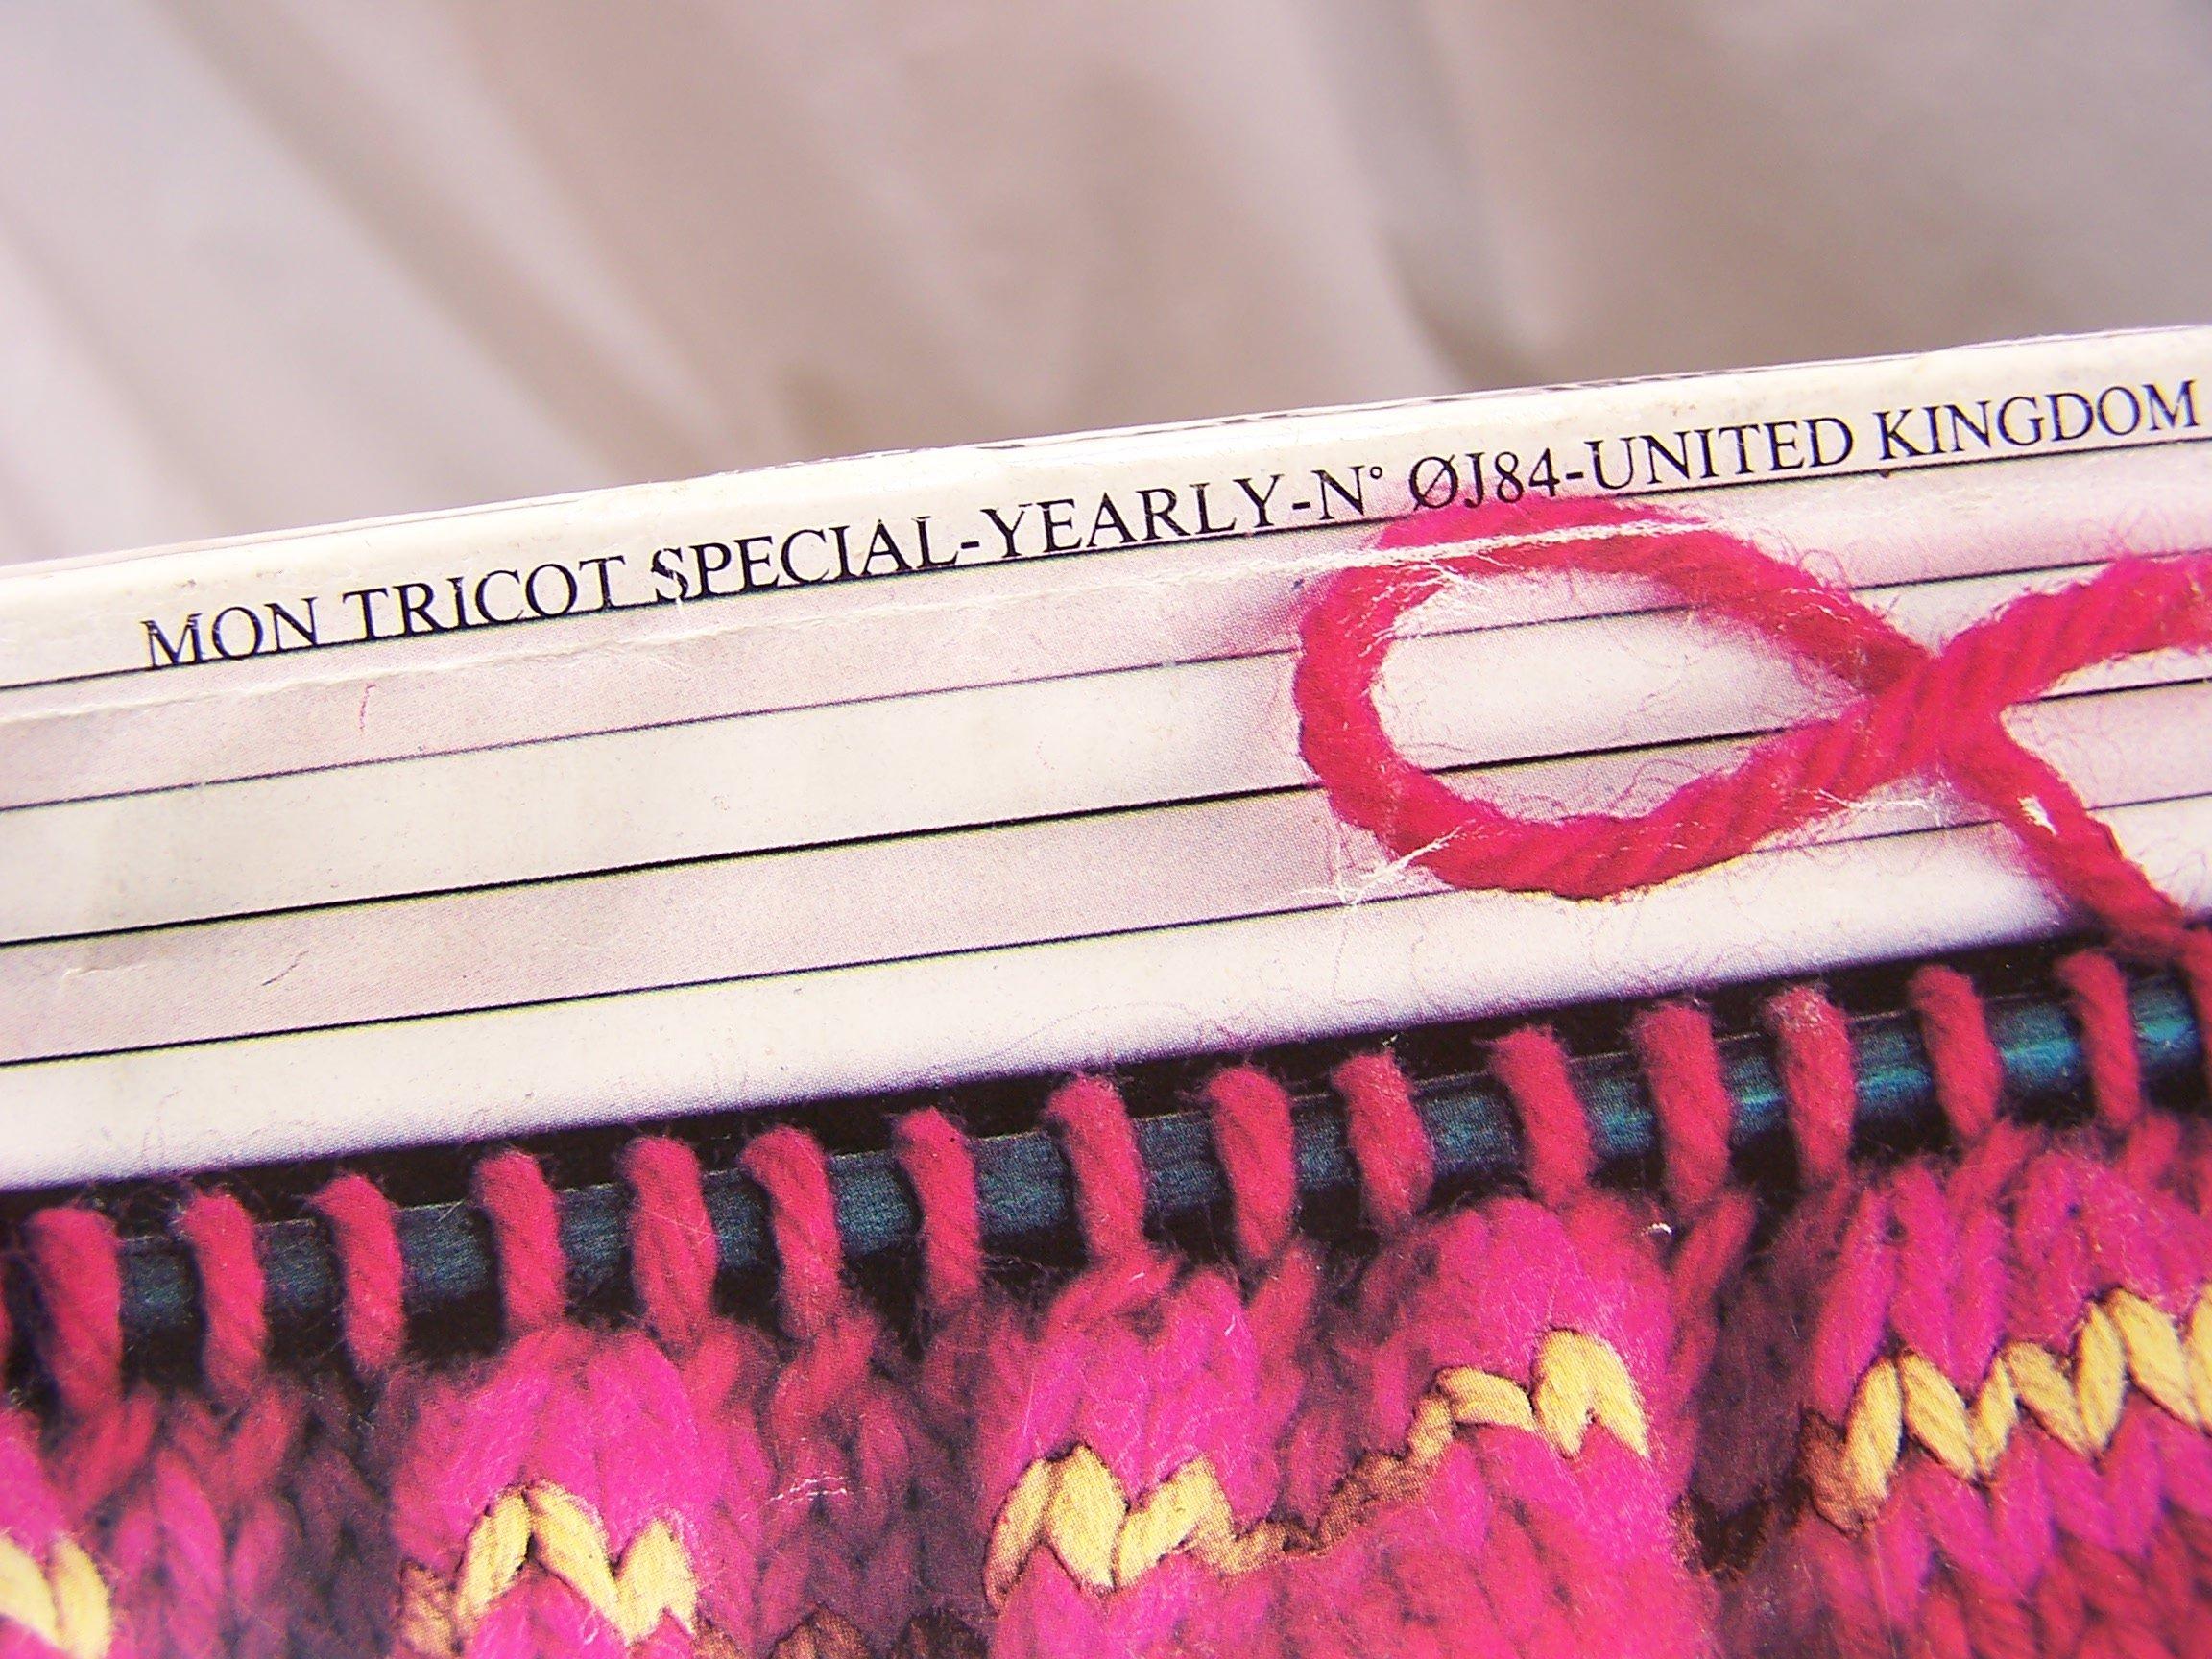 Knitting encyclopedia 1500 patterns needles new edition no oj 84 knitting encyclopedia 1500 patterns needles new edition no oj 84 mon tricot amazon books fandeluxe Choice Image